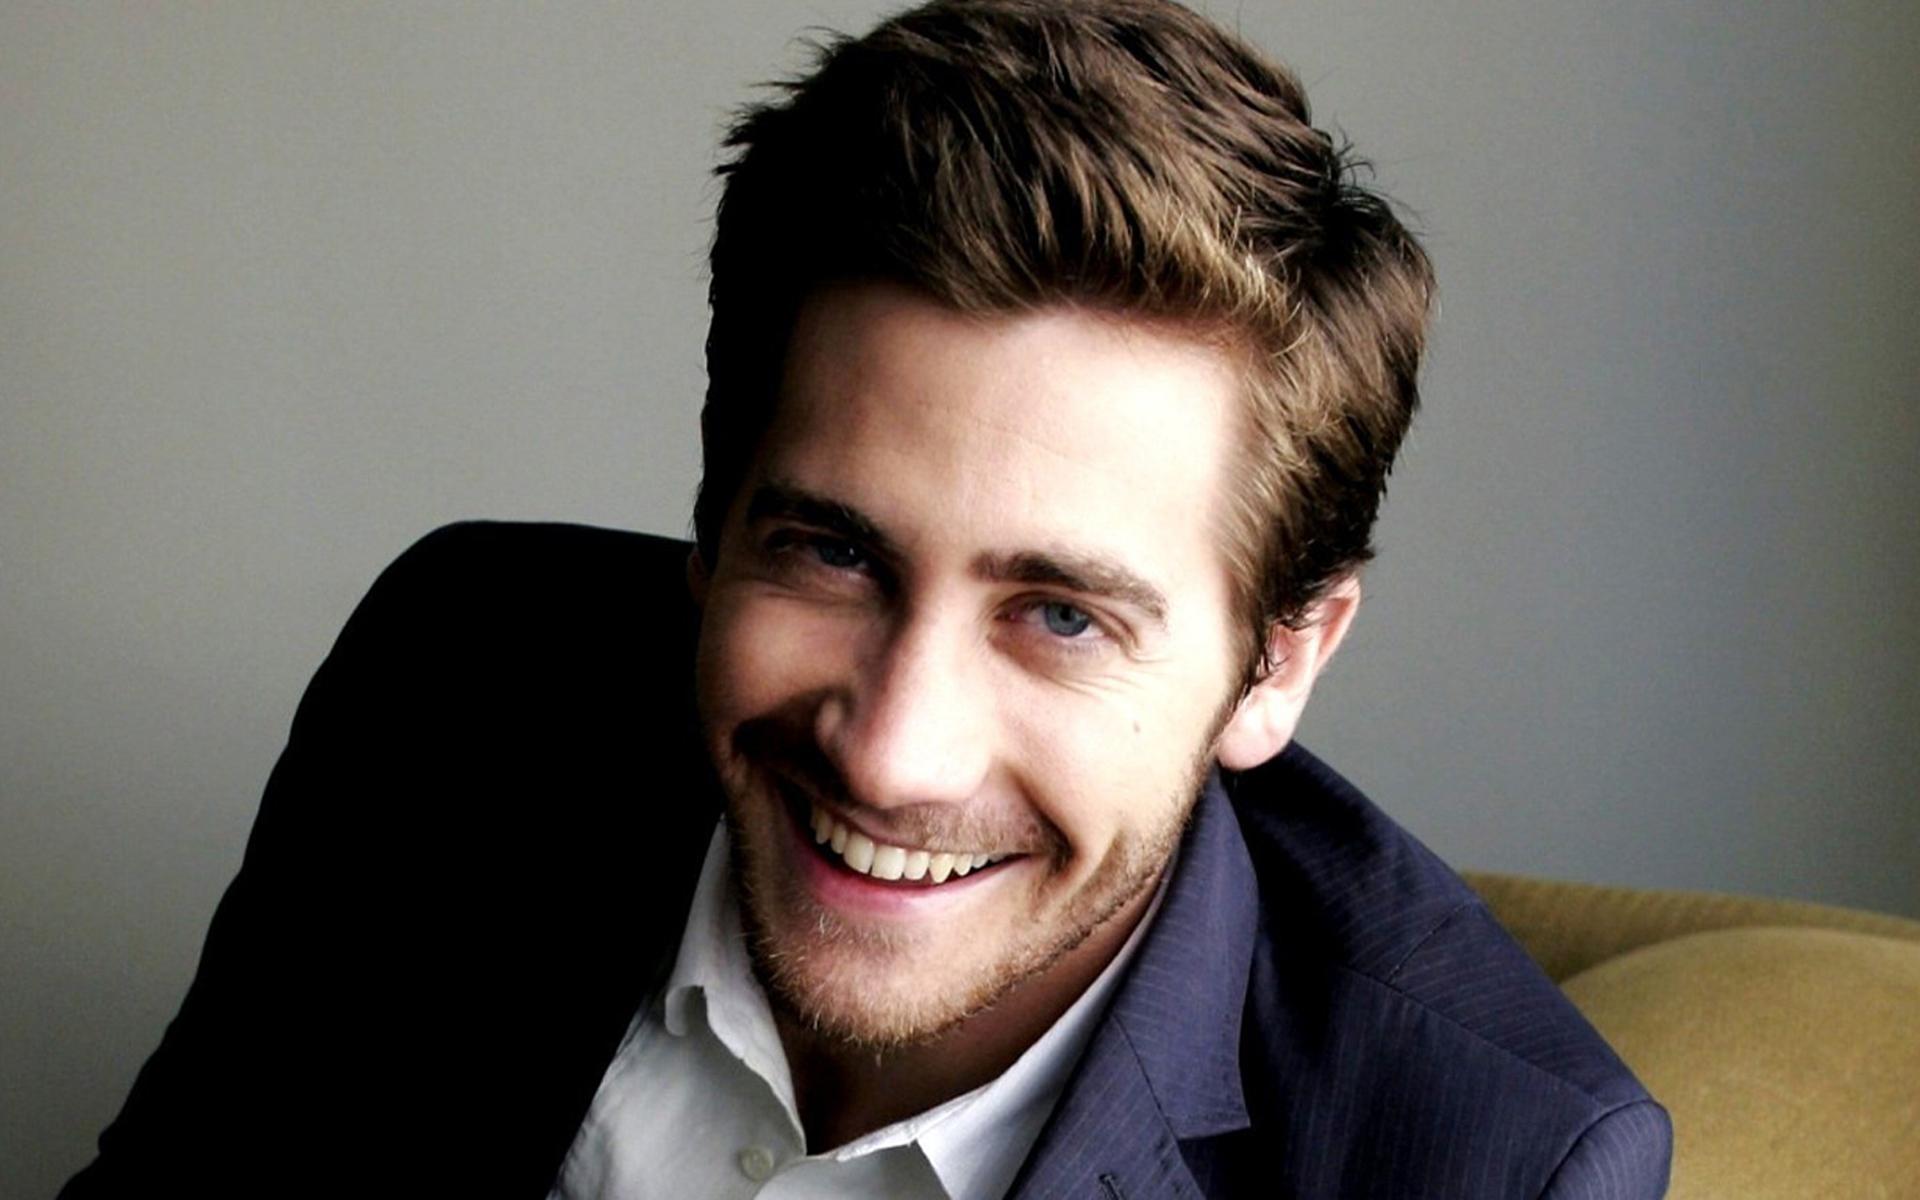 2160x3840 Jake Gyllenhaal Smile Images Sony Xperia XXZZ5 Premium 1920x1200